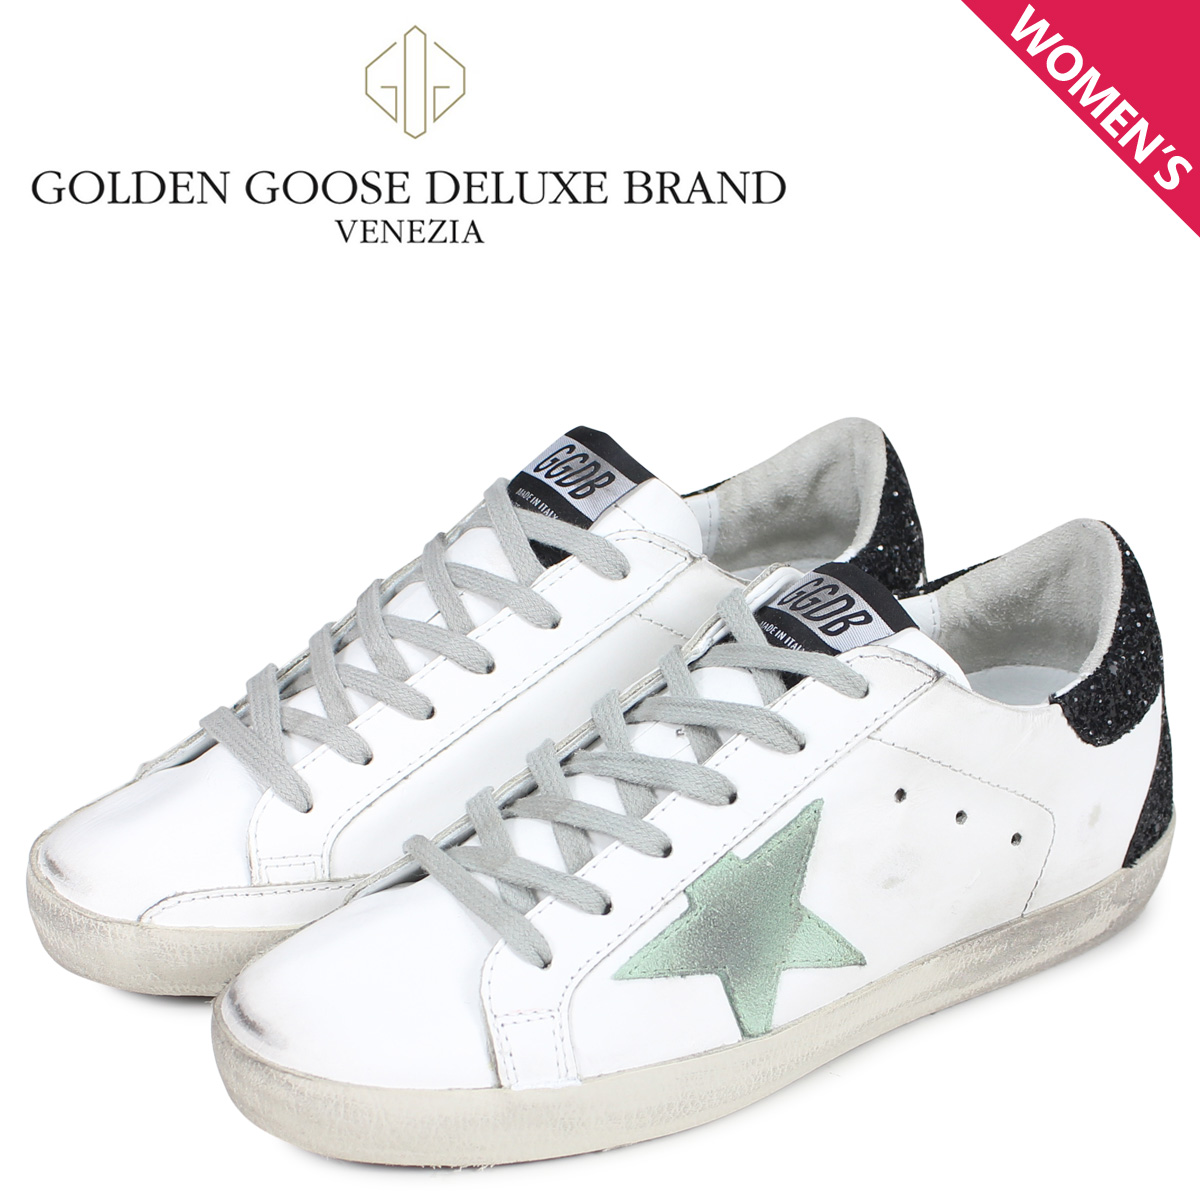 Golden Goose ゴールデングース スニーカー スーパースター レディース SNEAKERS SUPERSTAR ホワイト 白 G34WS590 M70 [3/4 新入荷]